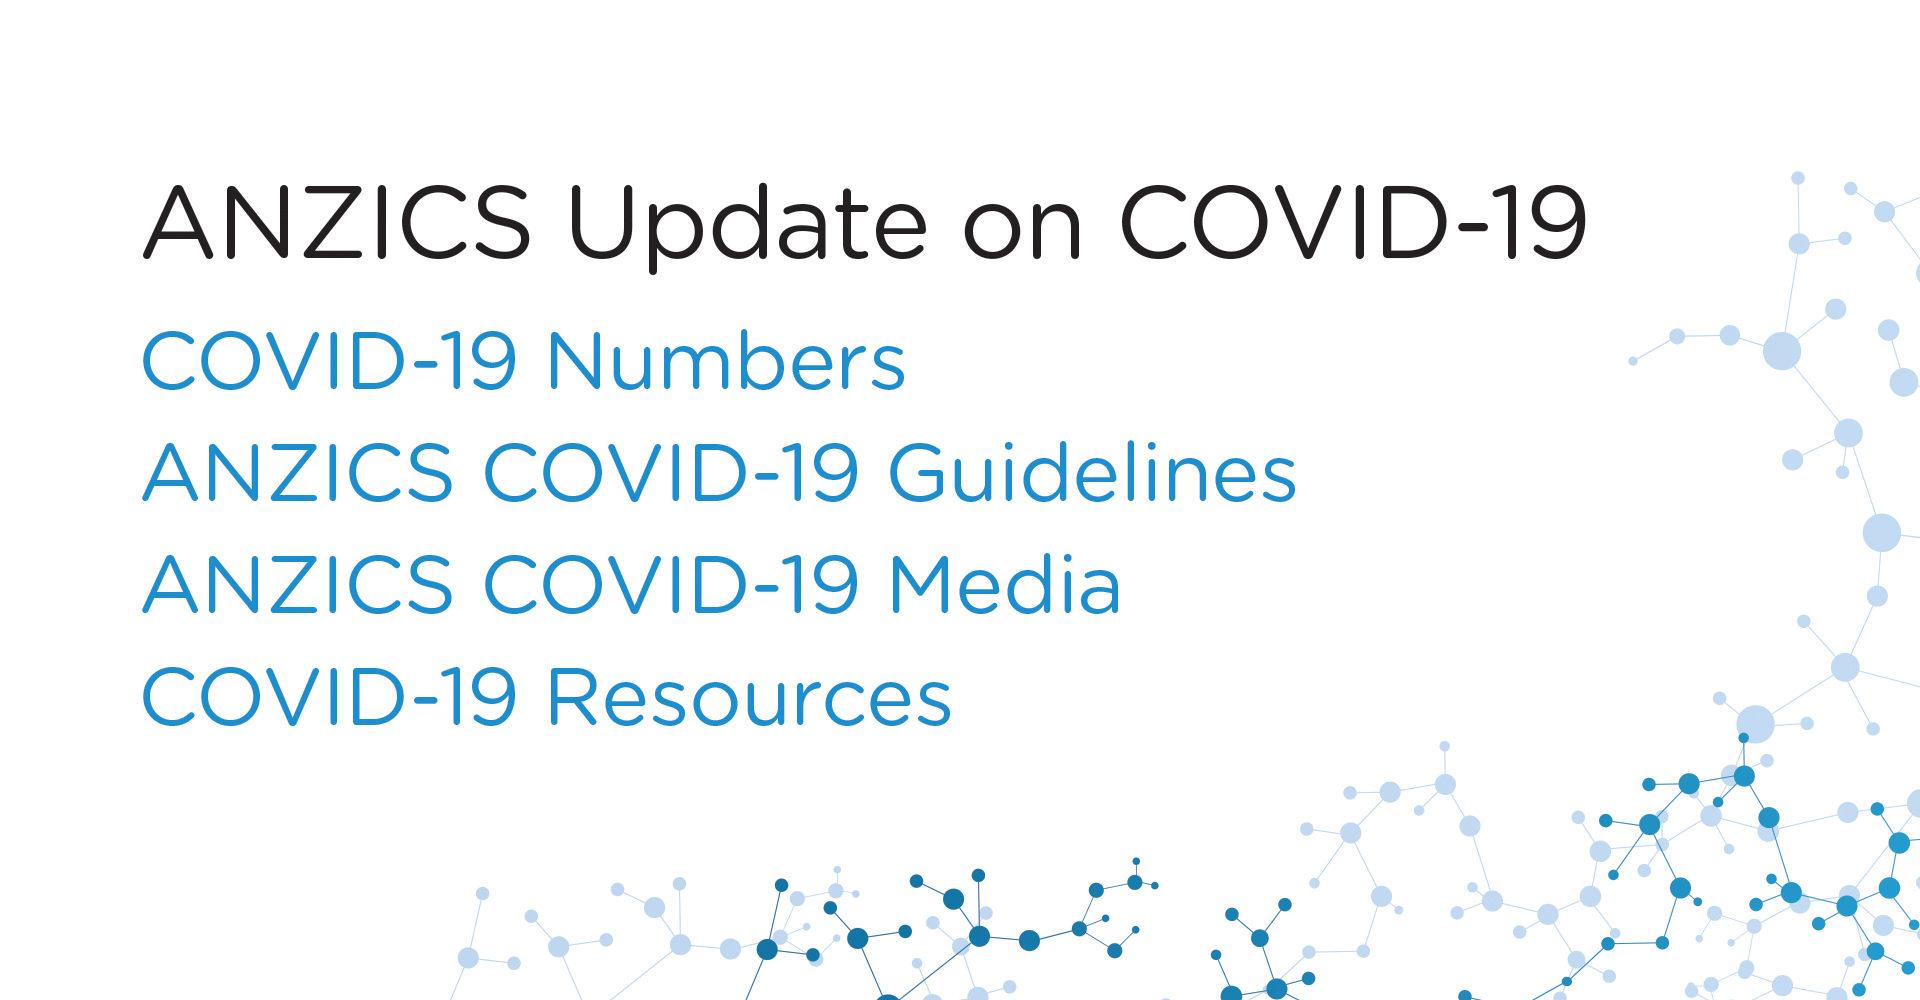 ANZICS Update on COVID-19